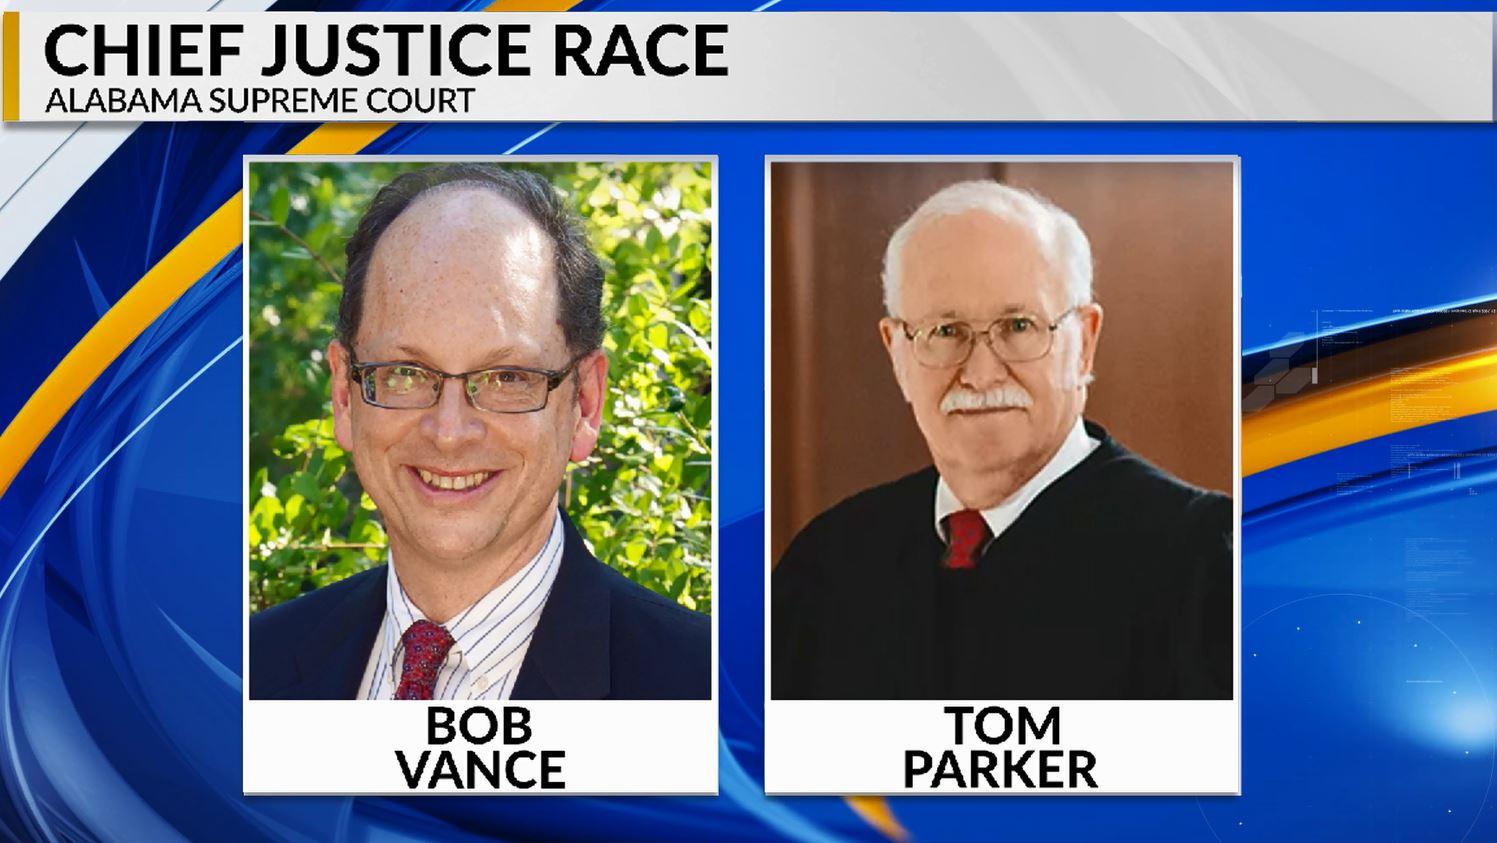 chief justice race_1532049190515.JPG.jpg